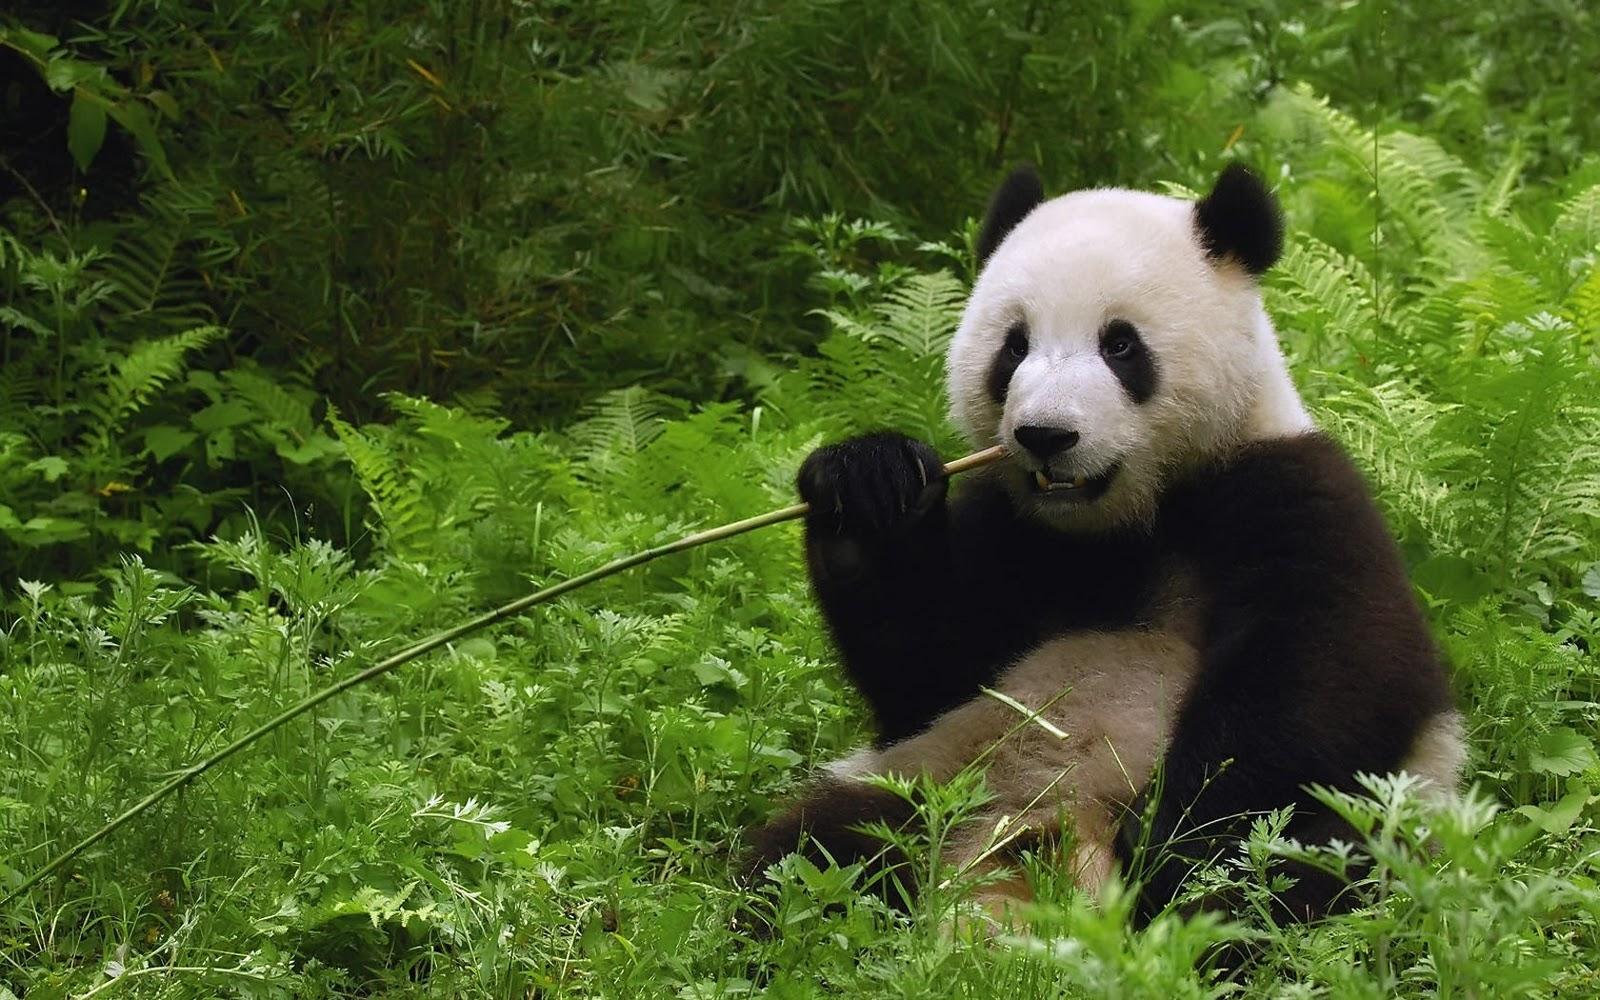 Central Wallpaper Cute Panda Bears HD Wallpapers 1600x1000